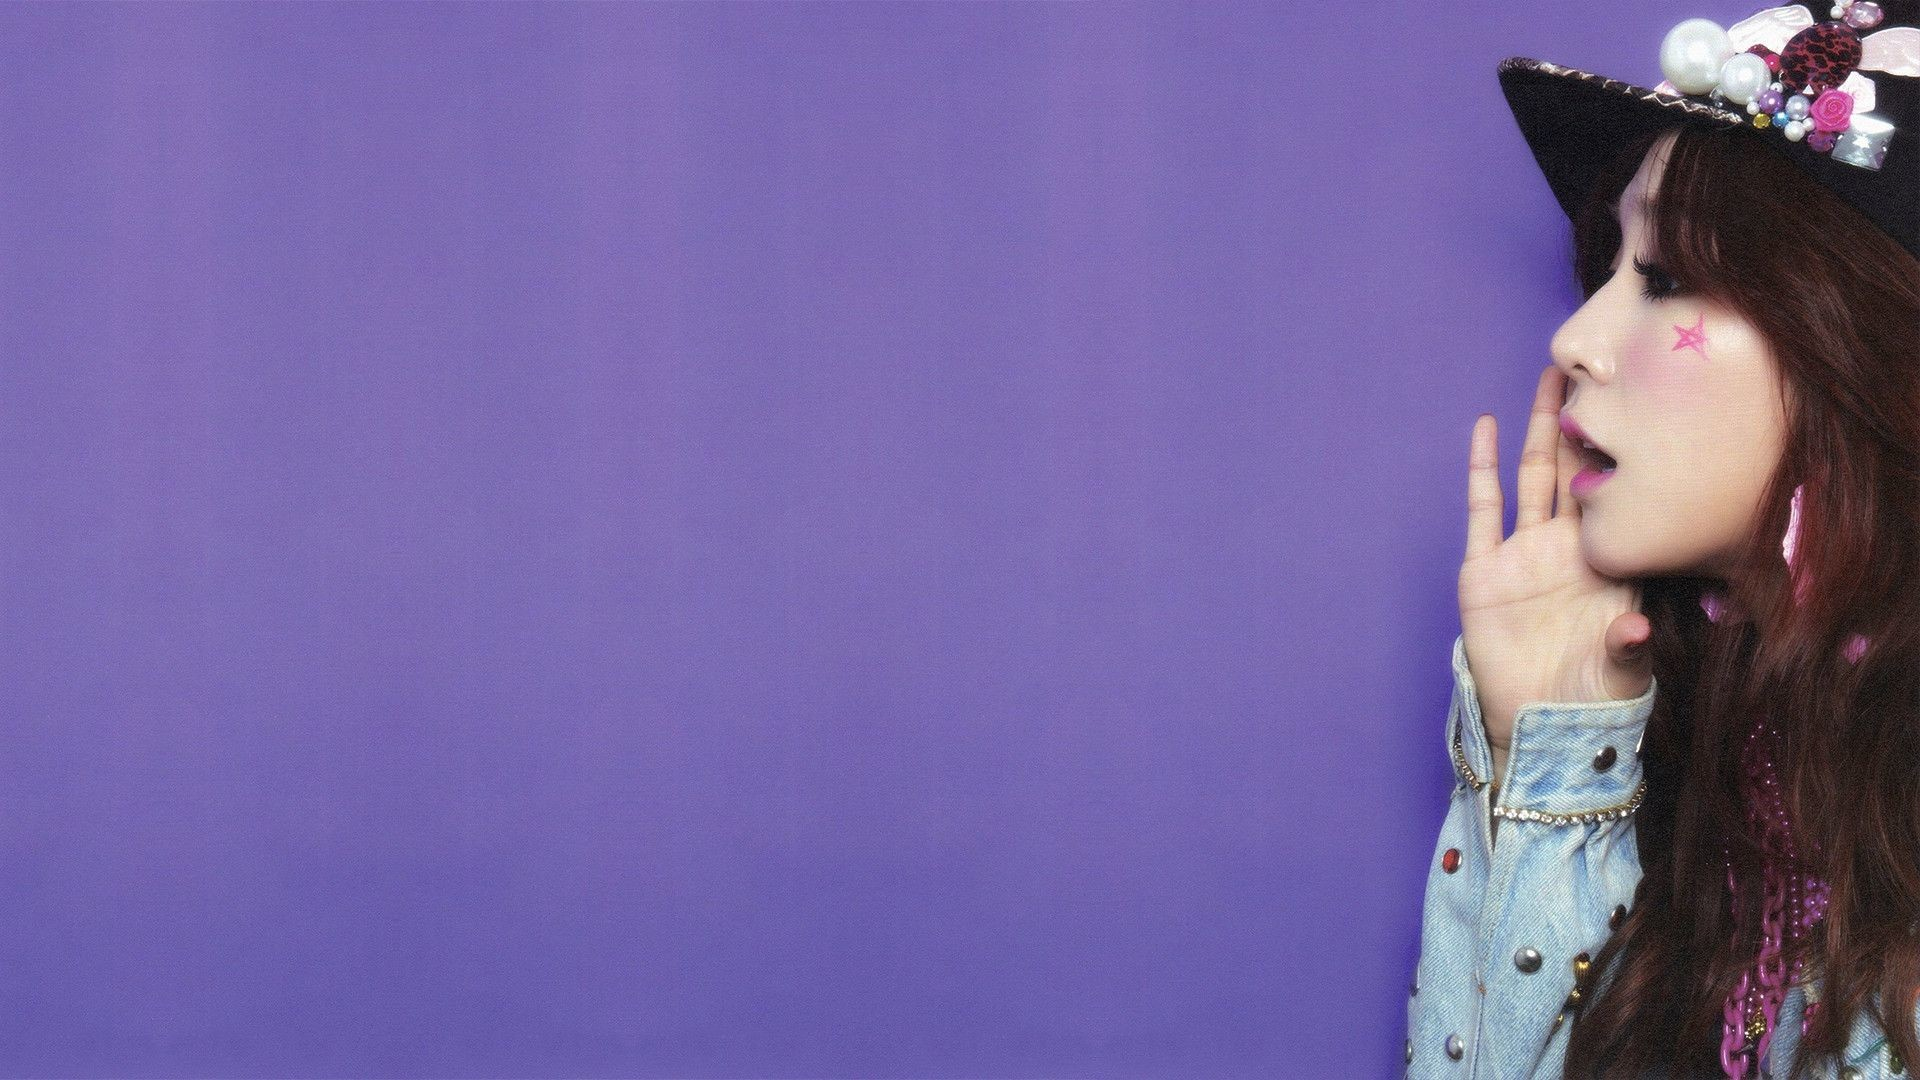 Tiffany Hwang 2015 Tumblr